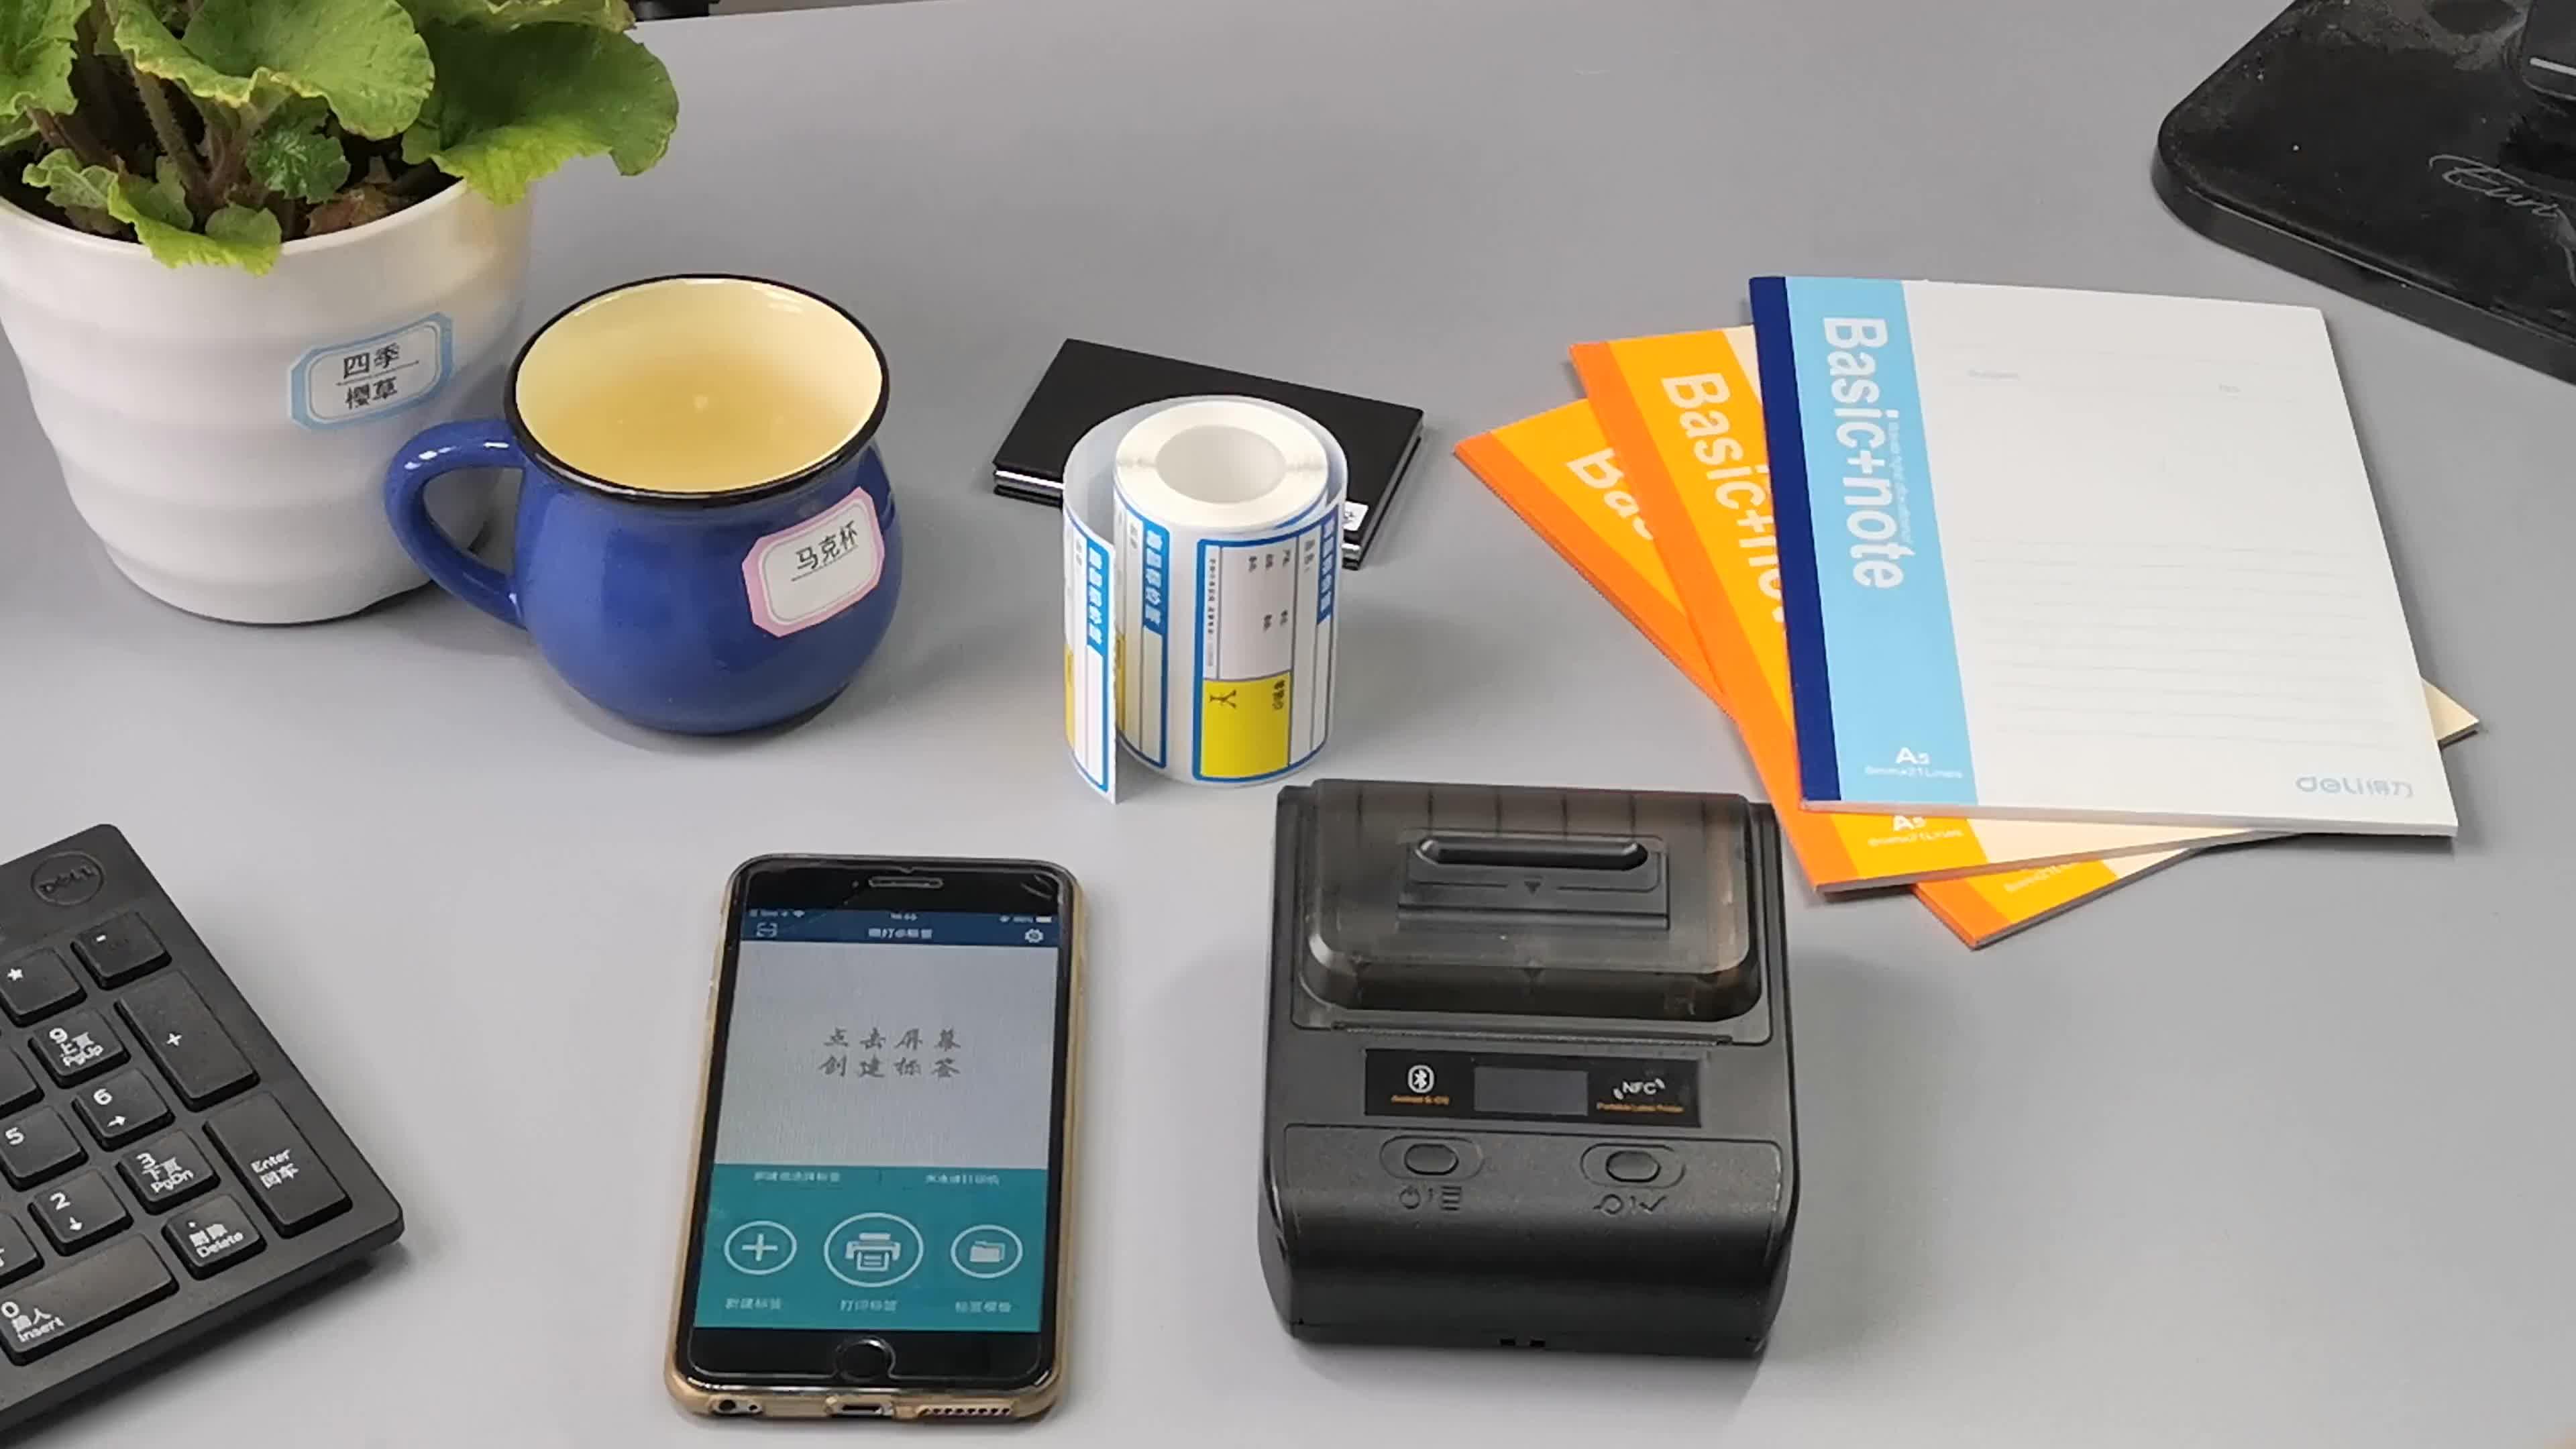 DeTong-DP30S 3 inch portable qr code printer 80mm small shelf label sticker price tag printer